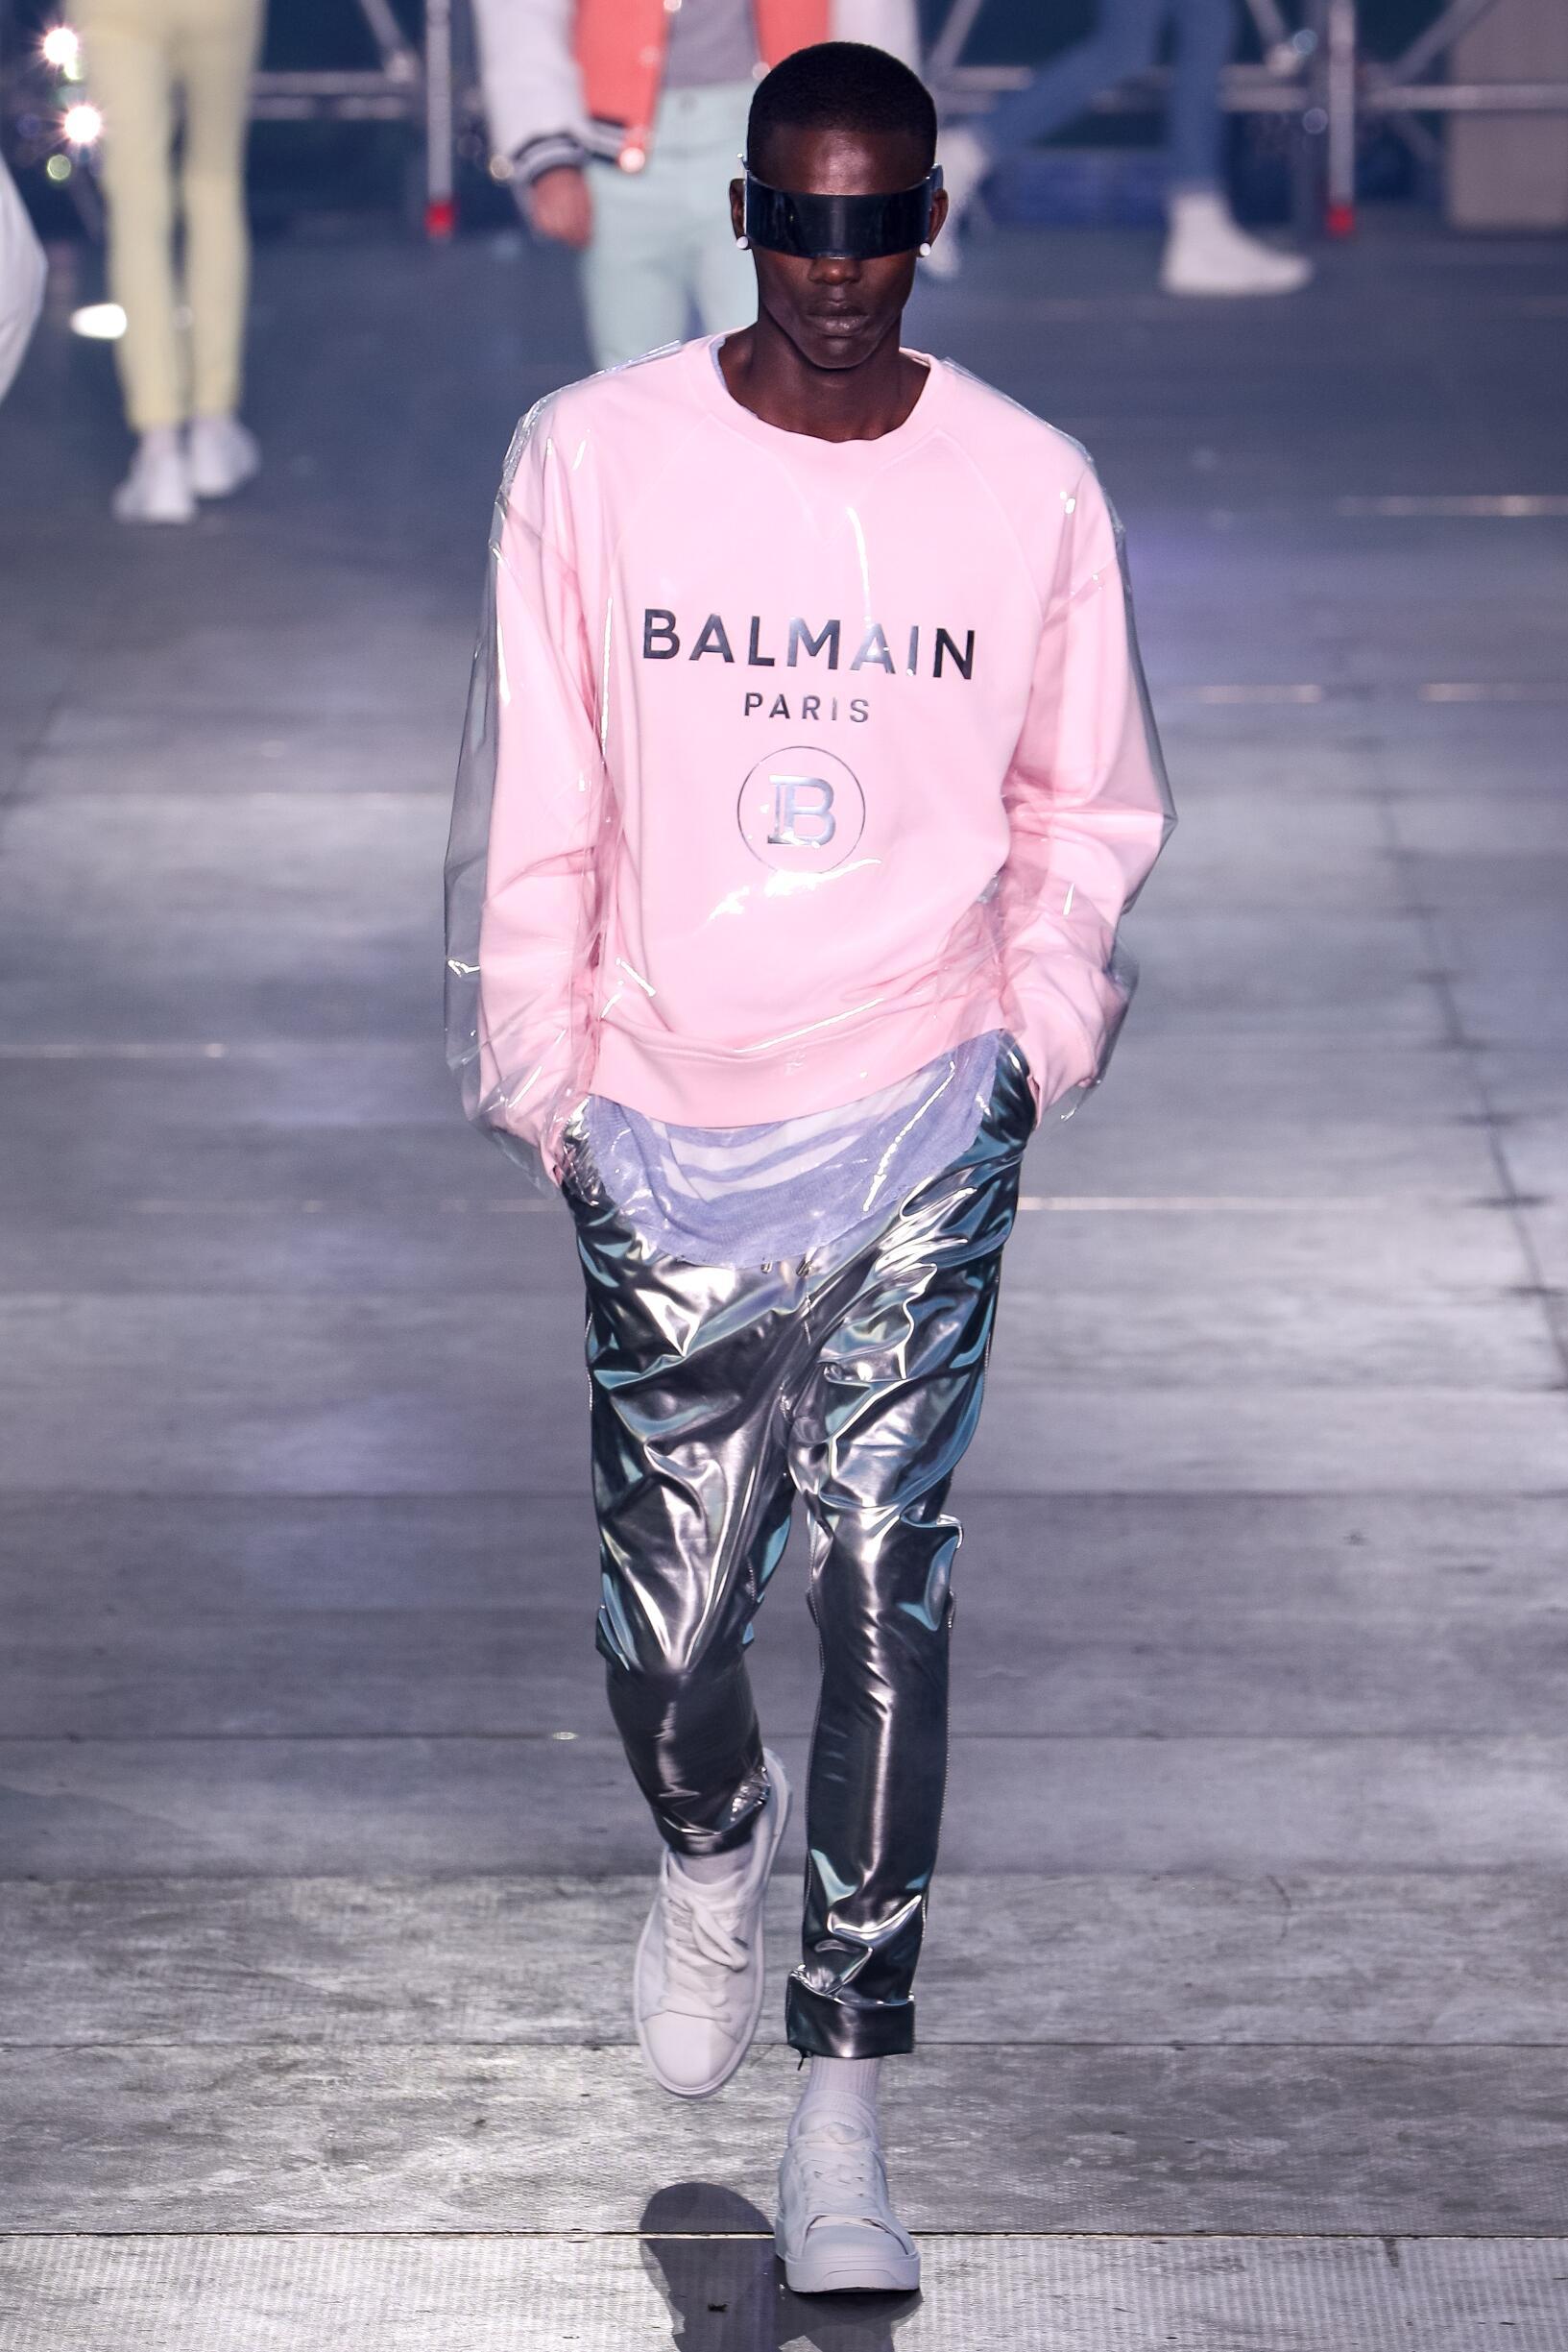 Spring Fashion Trends 2020 Balmain